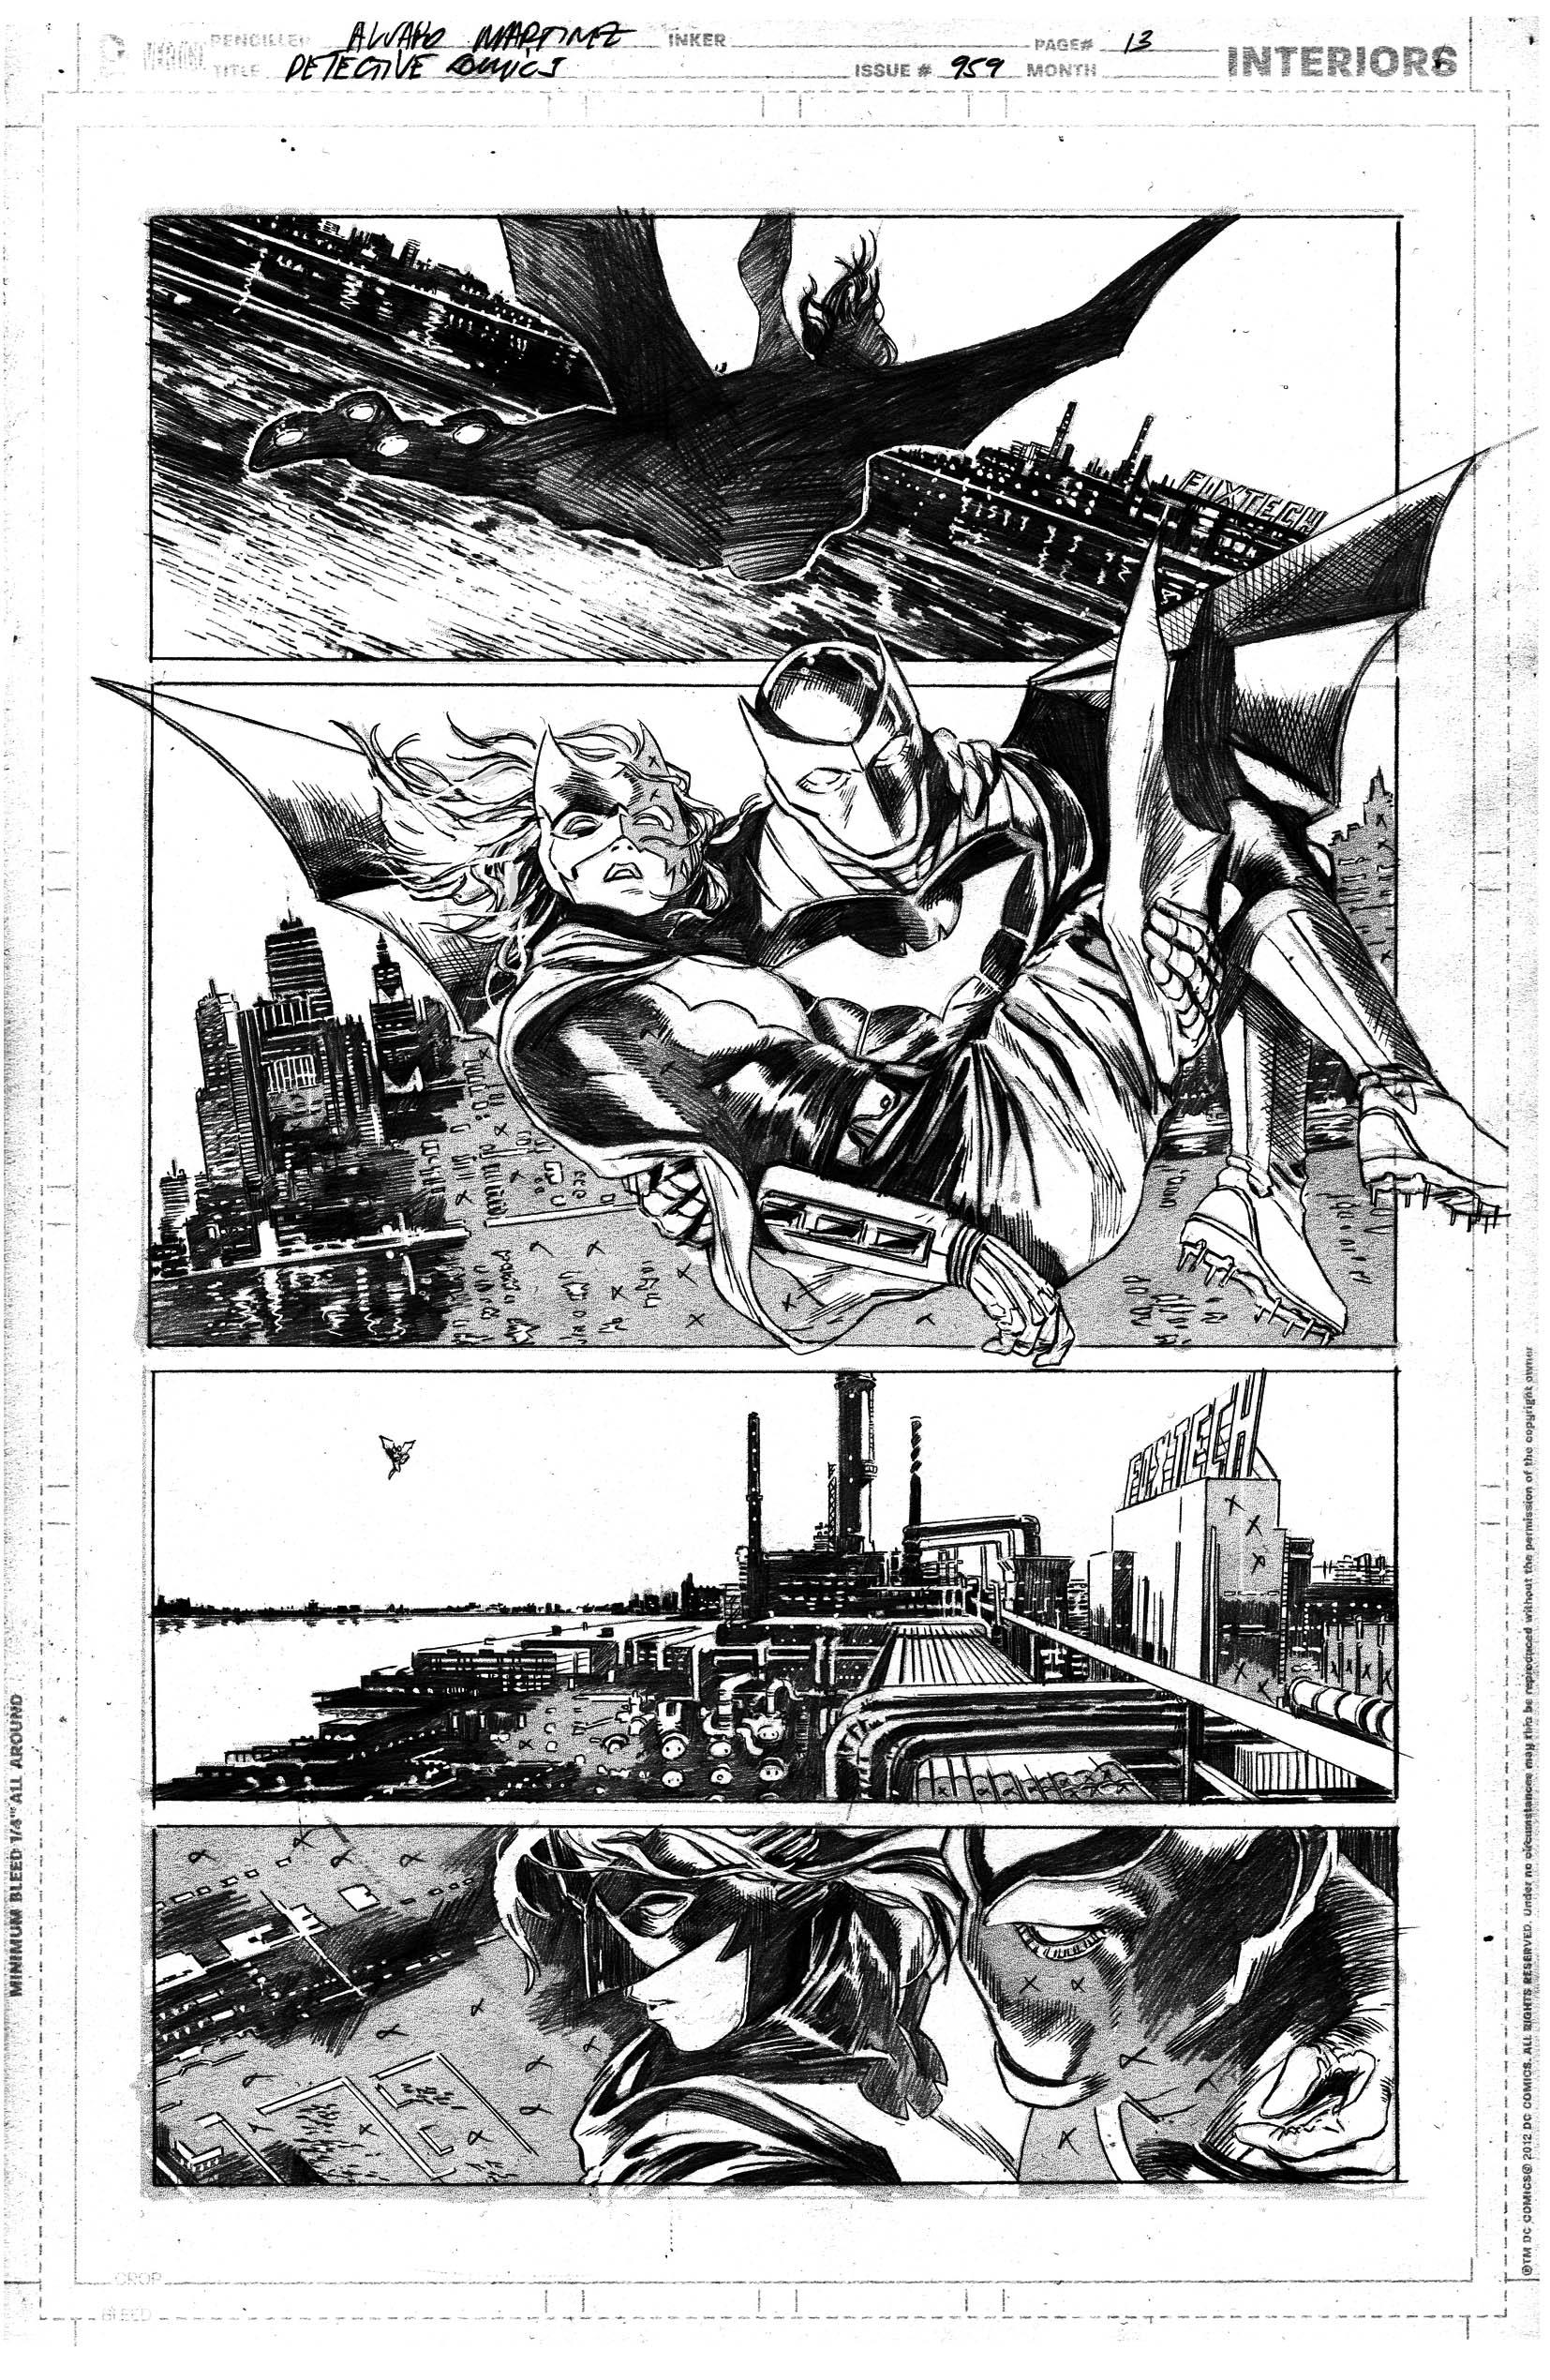 Detective Comics #959 page 13